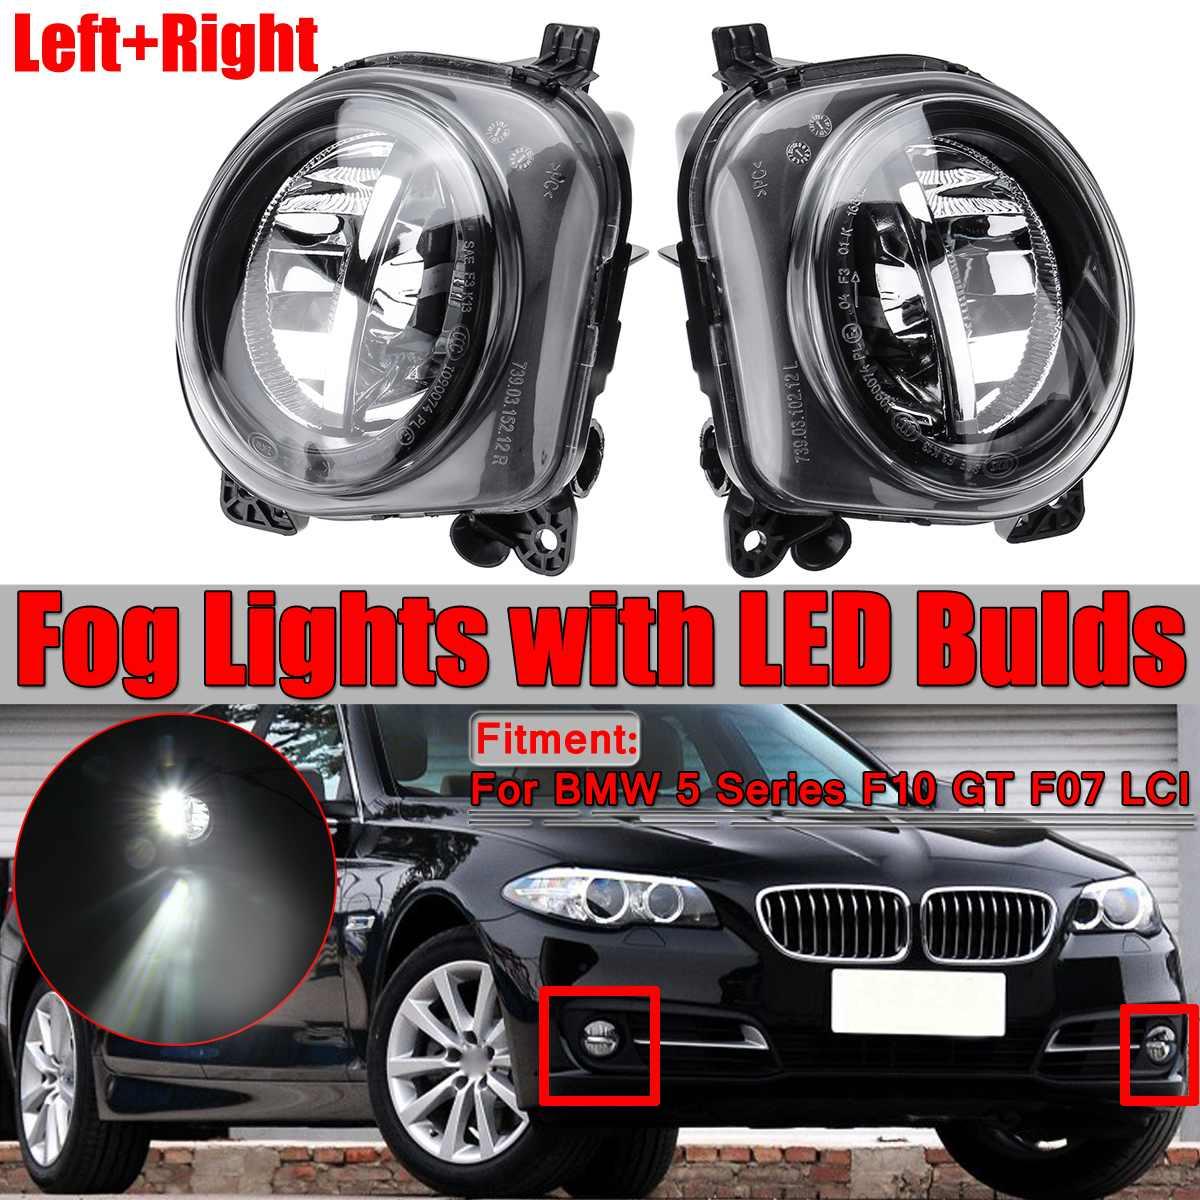 2x LED Light Car Front Fog Light Lamp LED With LED Bulds For BMW 5 Series F07 F10 GT F11 F18 LCI 535i 528i 550i 2013 2014 2015